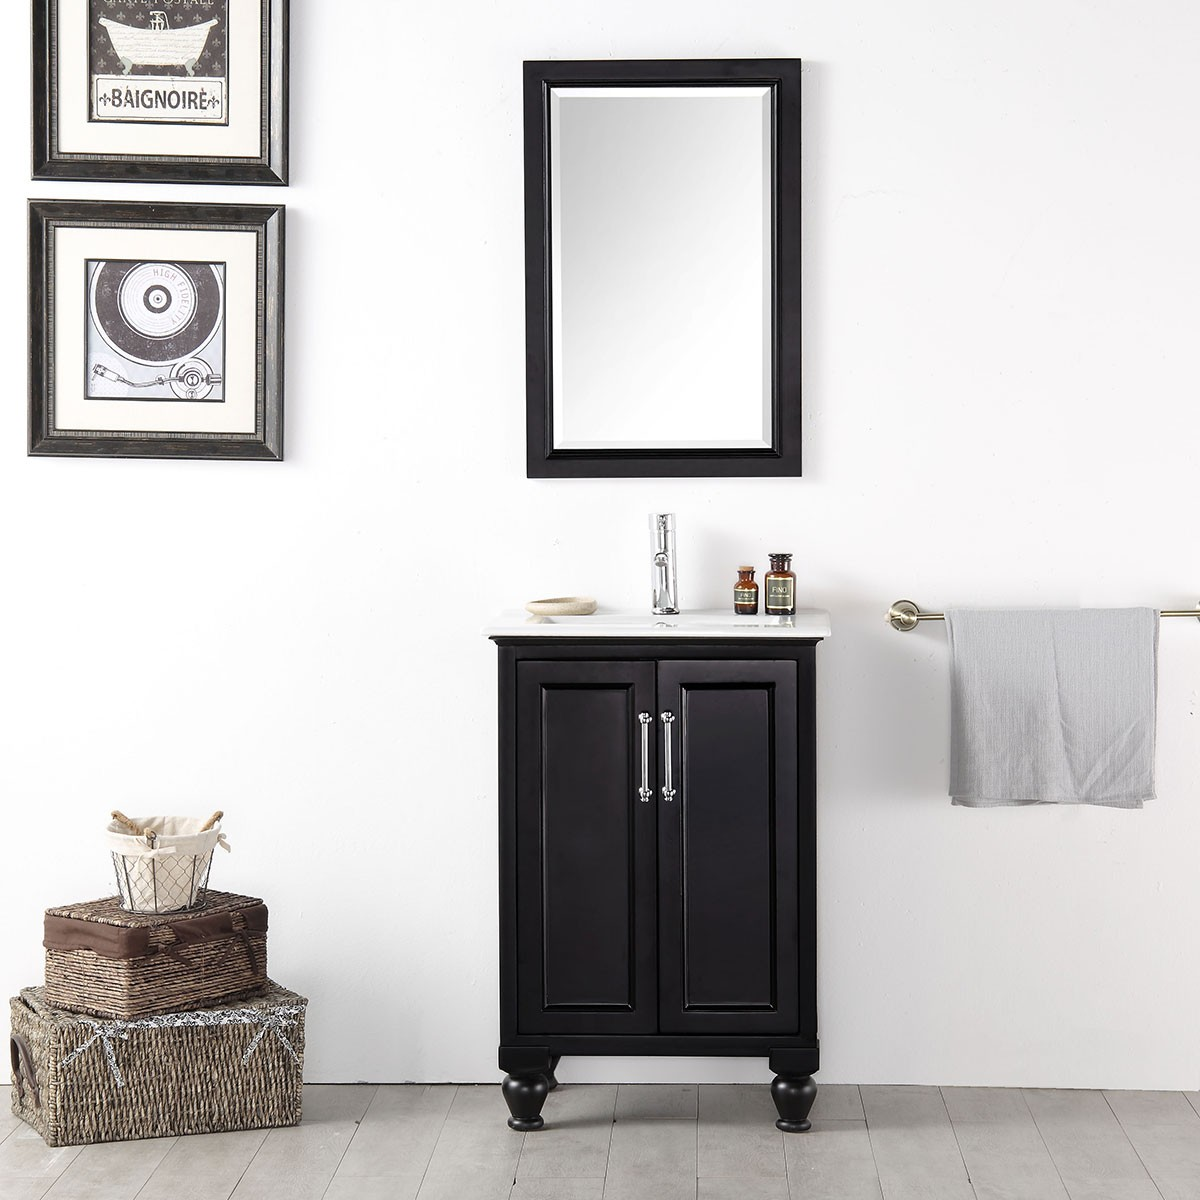 24 In. Freestanding Bathroom Vanity Set without Mirror (DK-6524-E ...